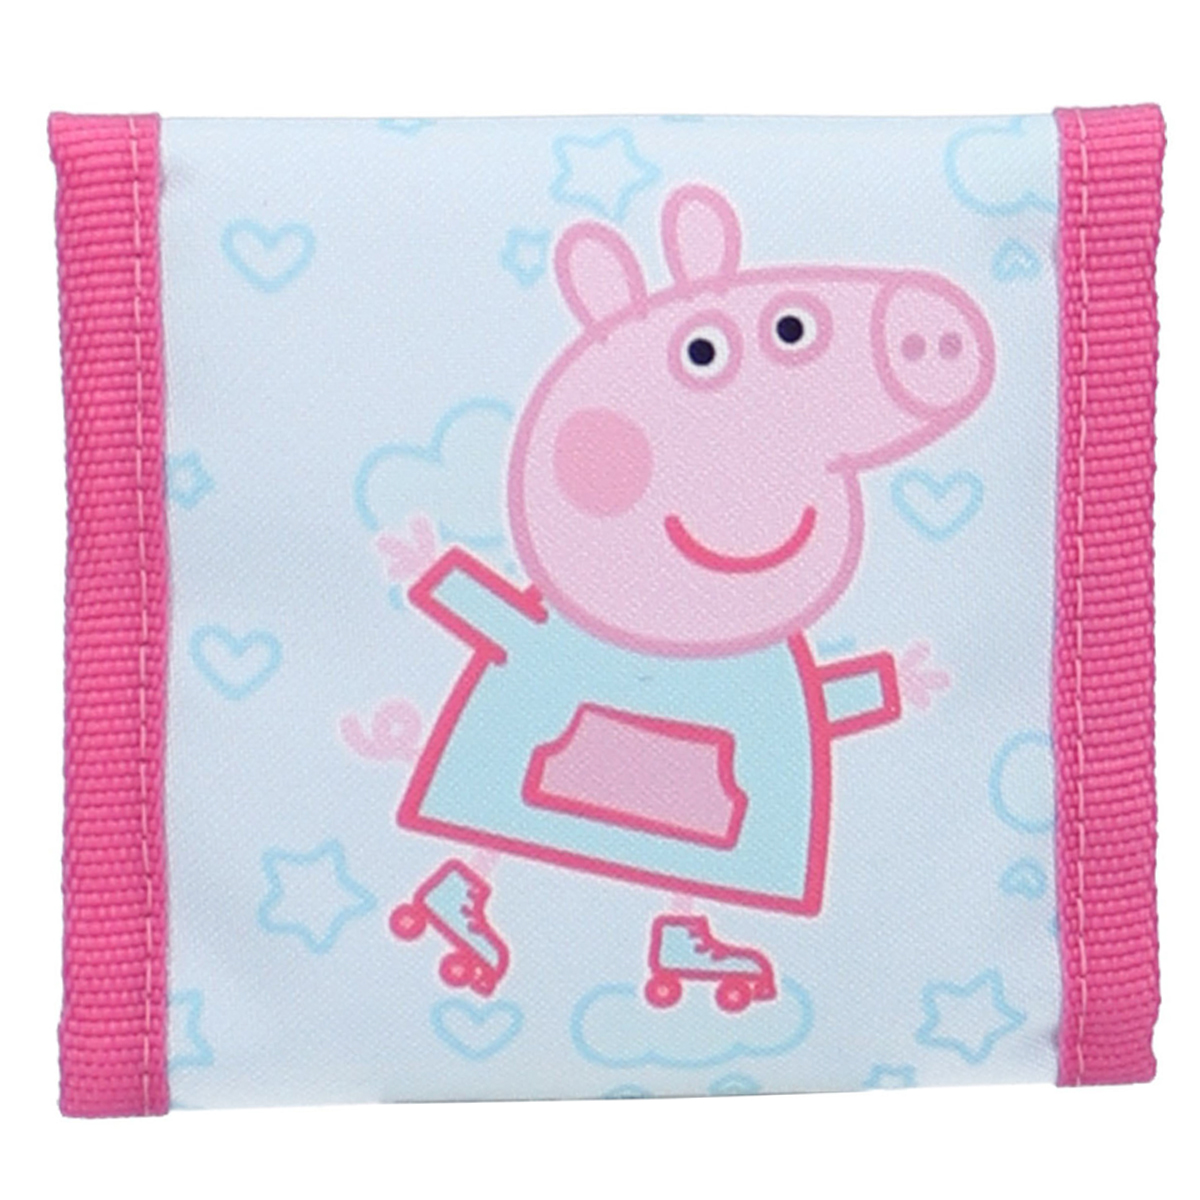 Portefeuille scratch \'Peppa Pig\' bleu rose - 10x10 cm - [R0504]